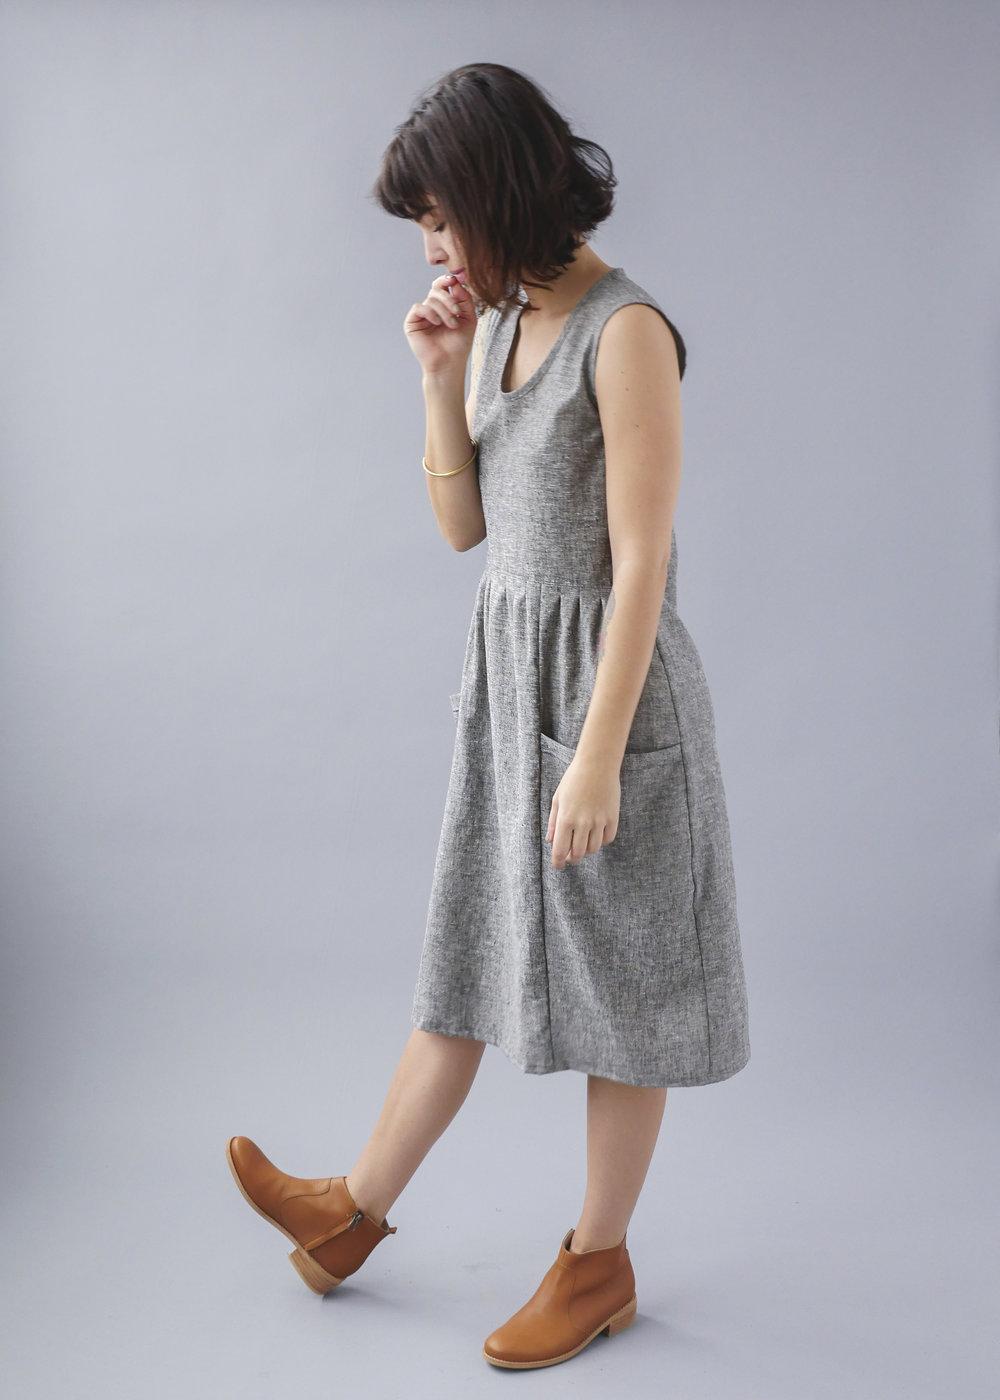 Temperate Jan sleeveless pockets grey dress-3.jpg